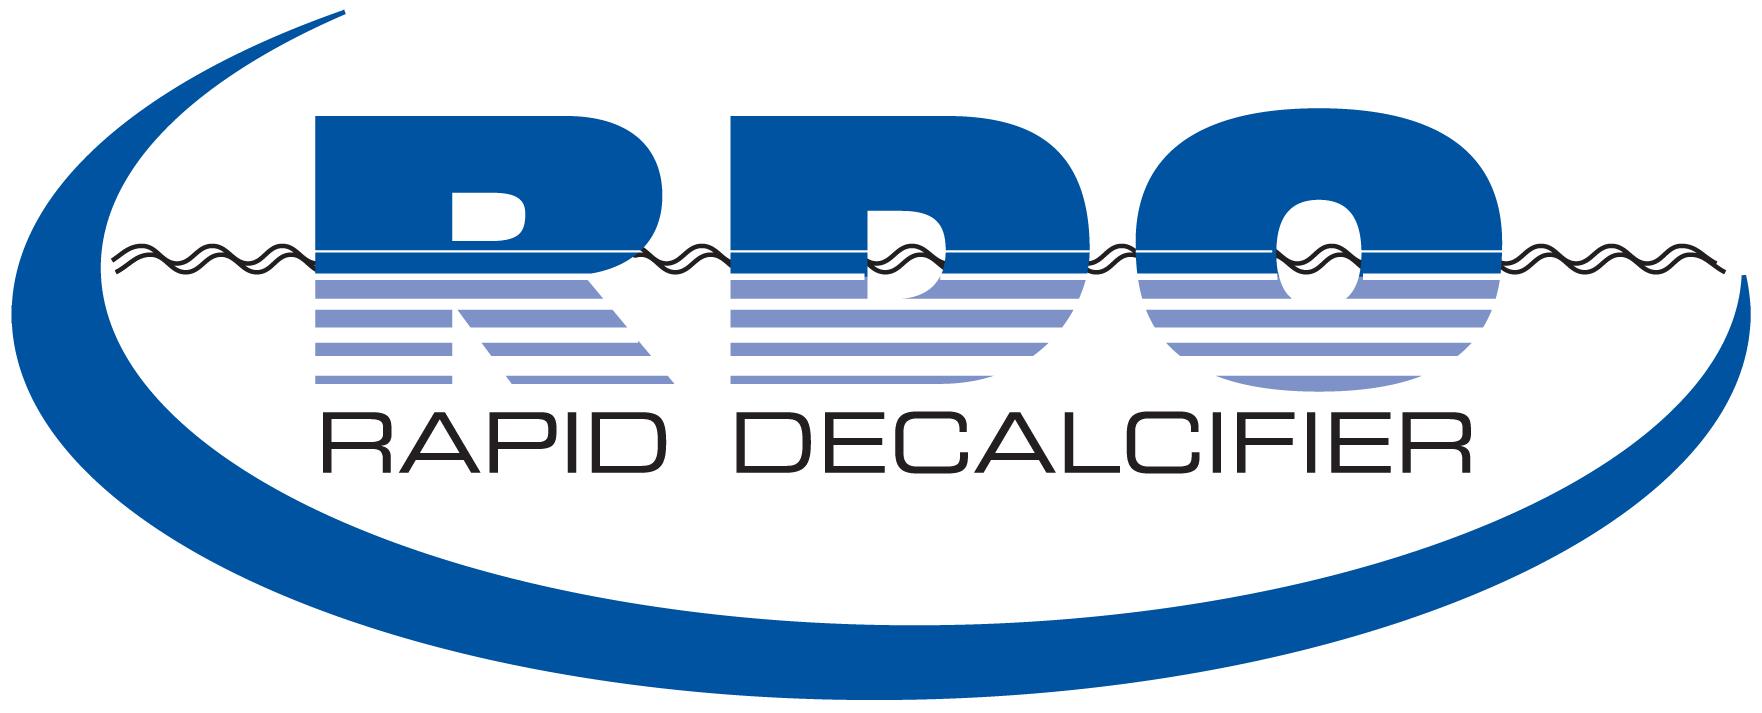 RDO Rapid Decalcifier Logo